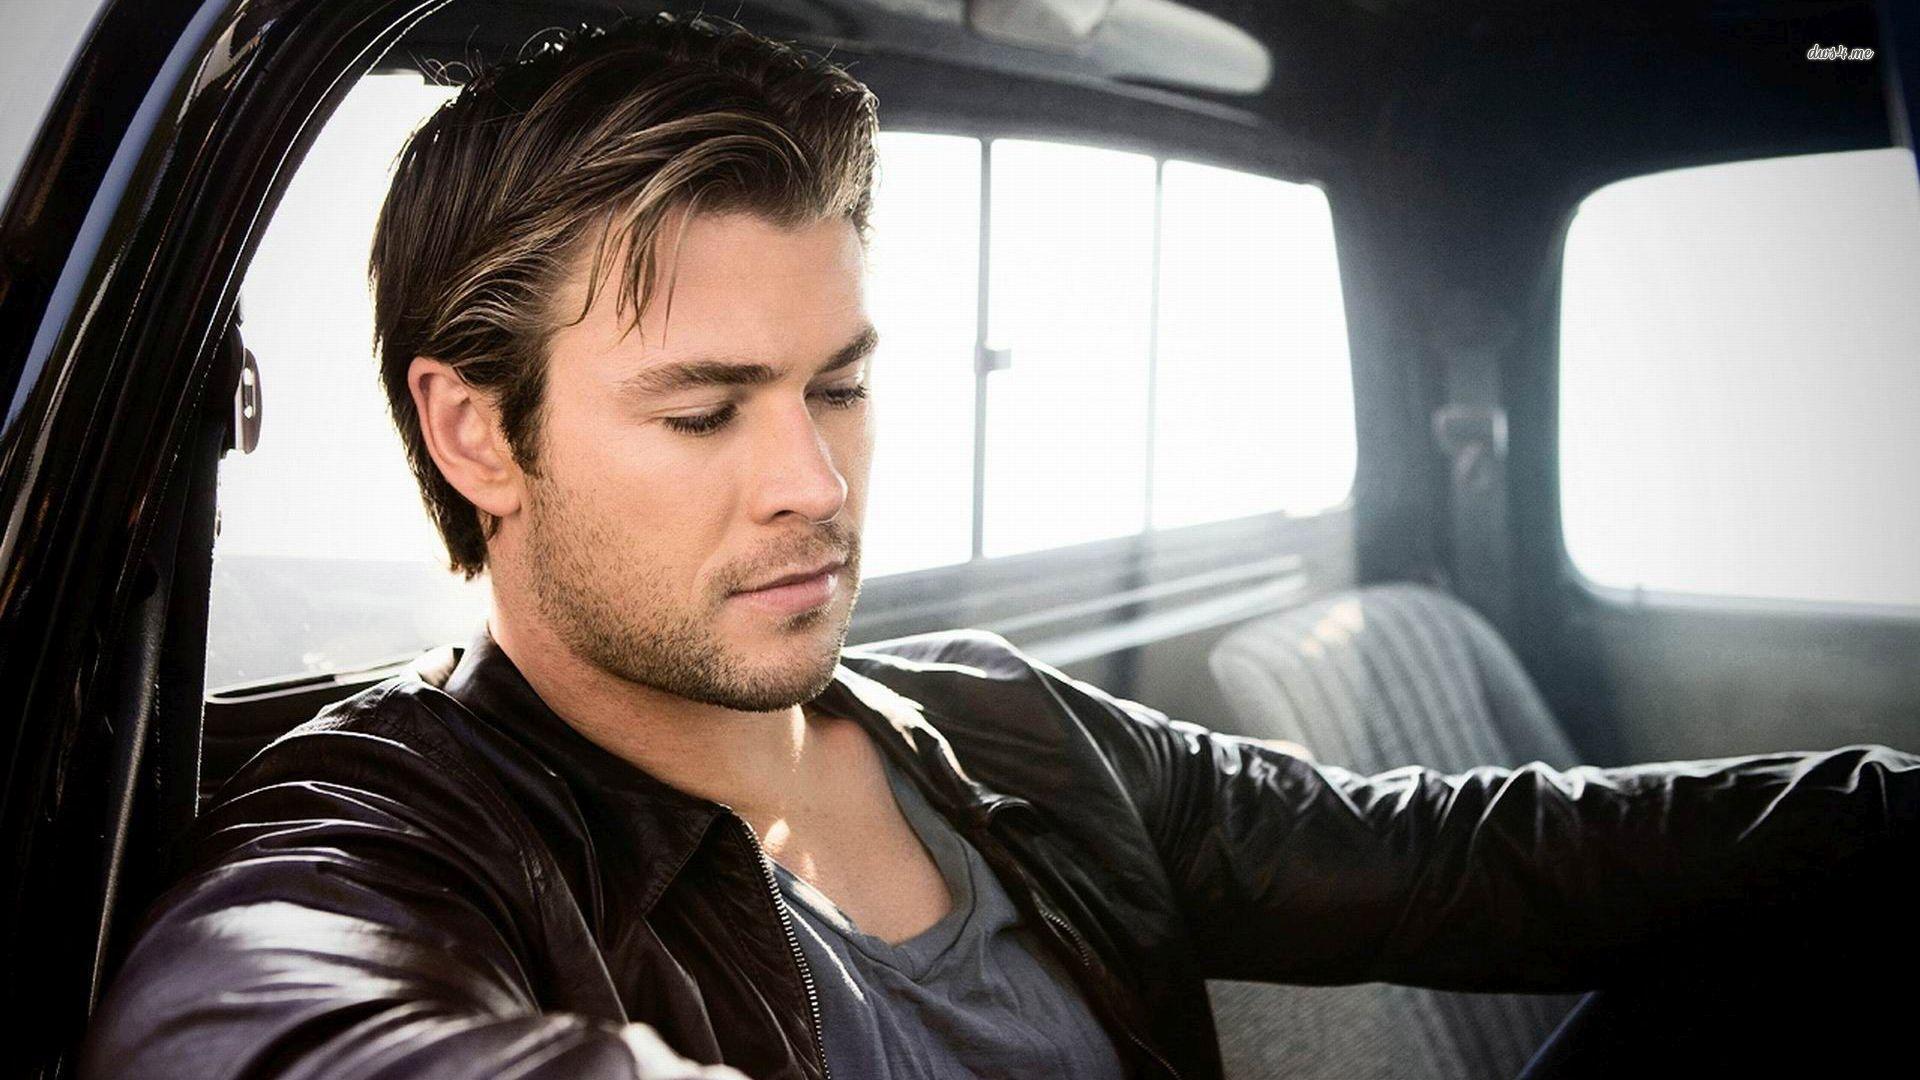 Chris Hemsworth High Definition Wallpapers